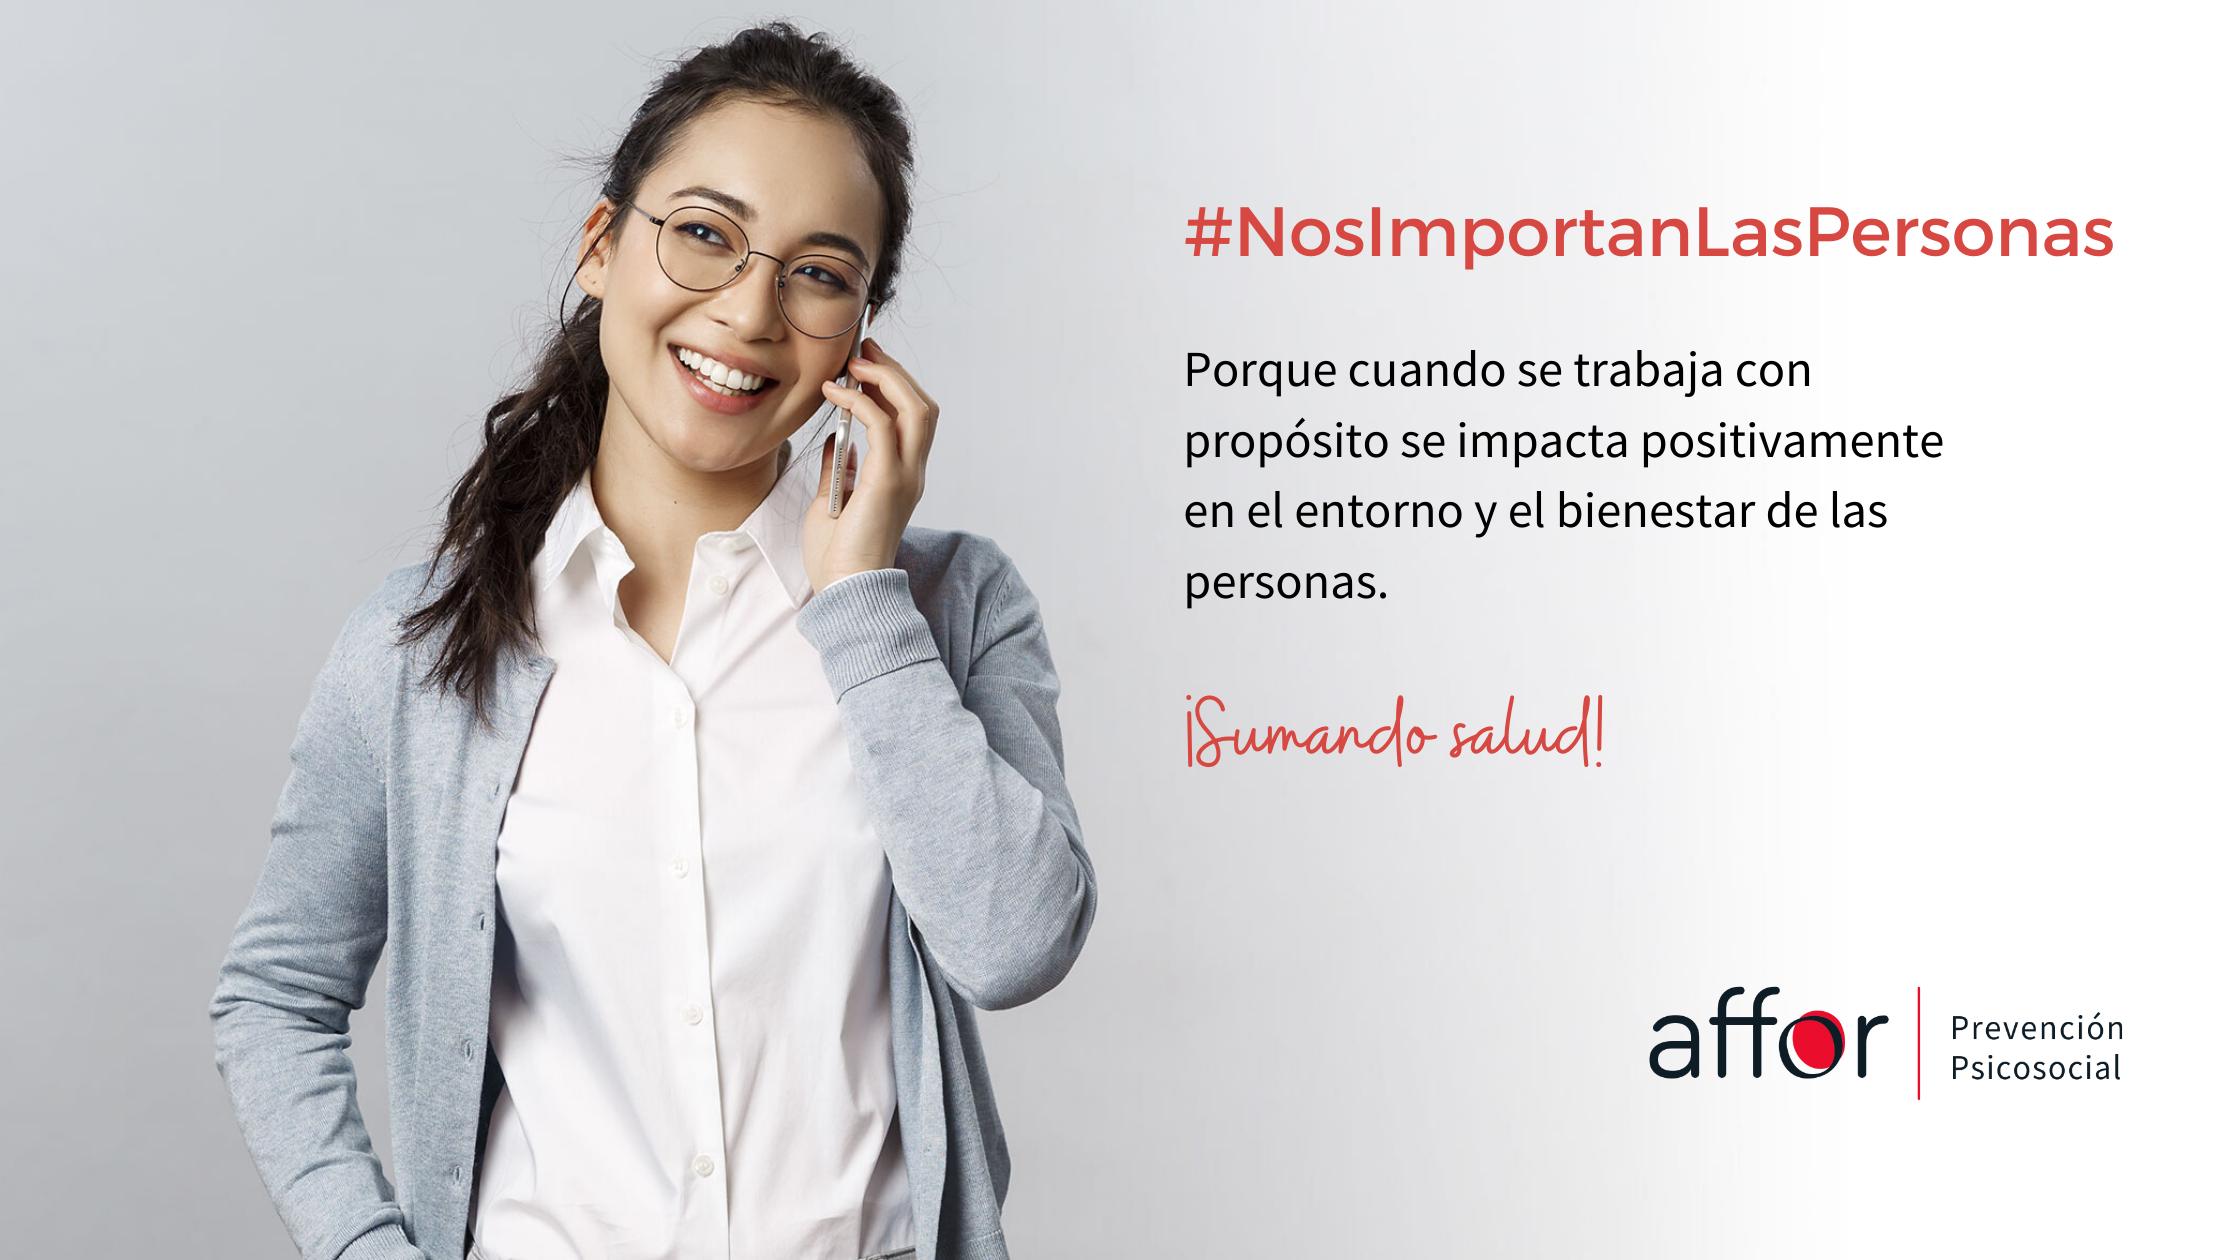 ##NosImportanLasPersonas